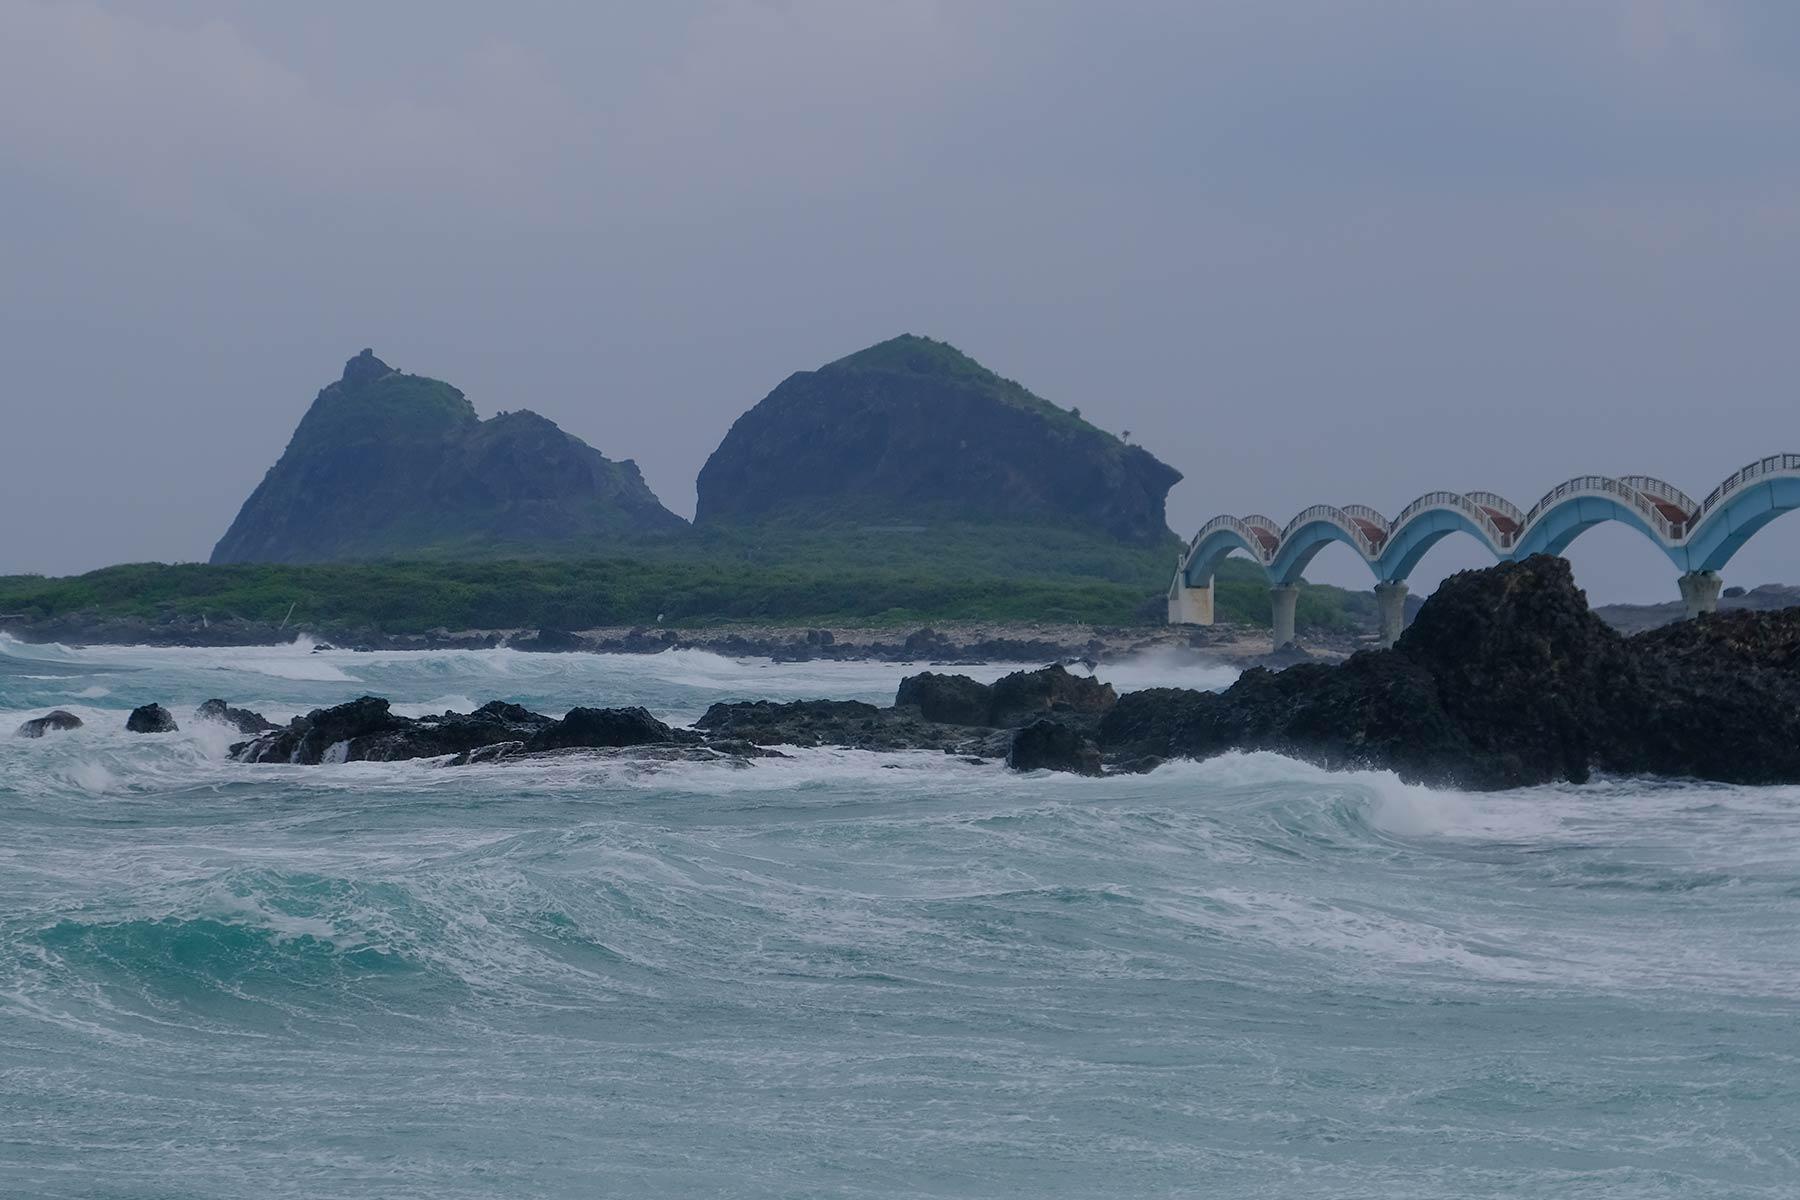 Sanxiantai Bogenbrücke bei starkem Wind in Taiwan